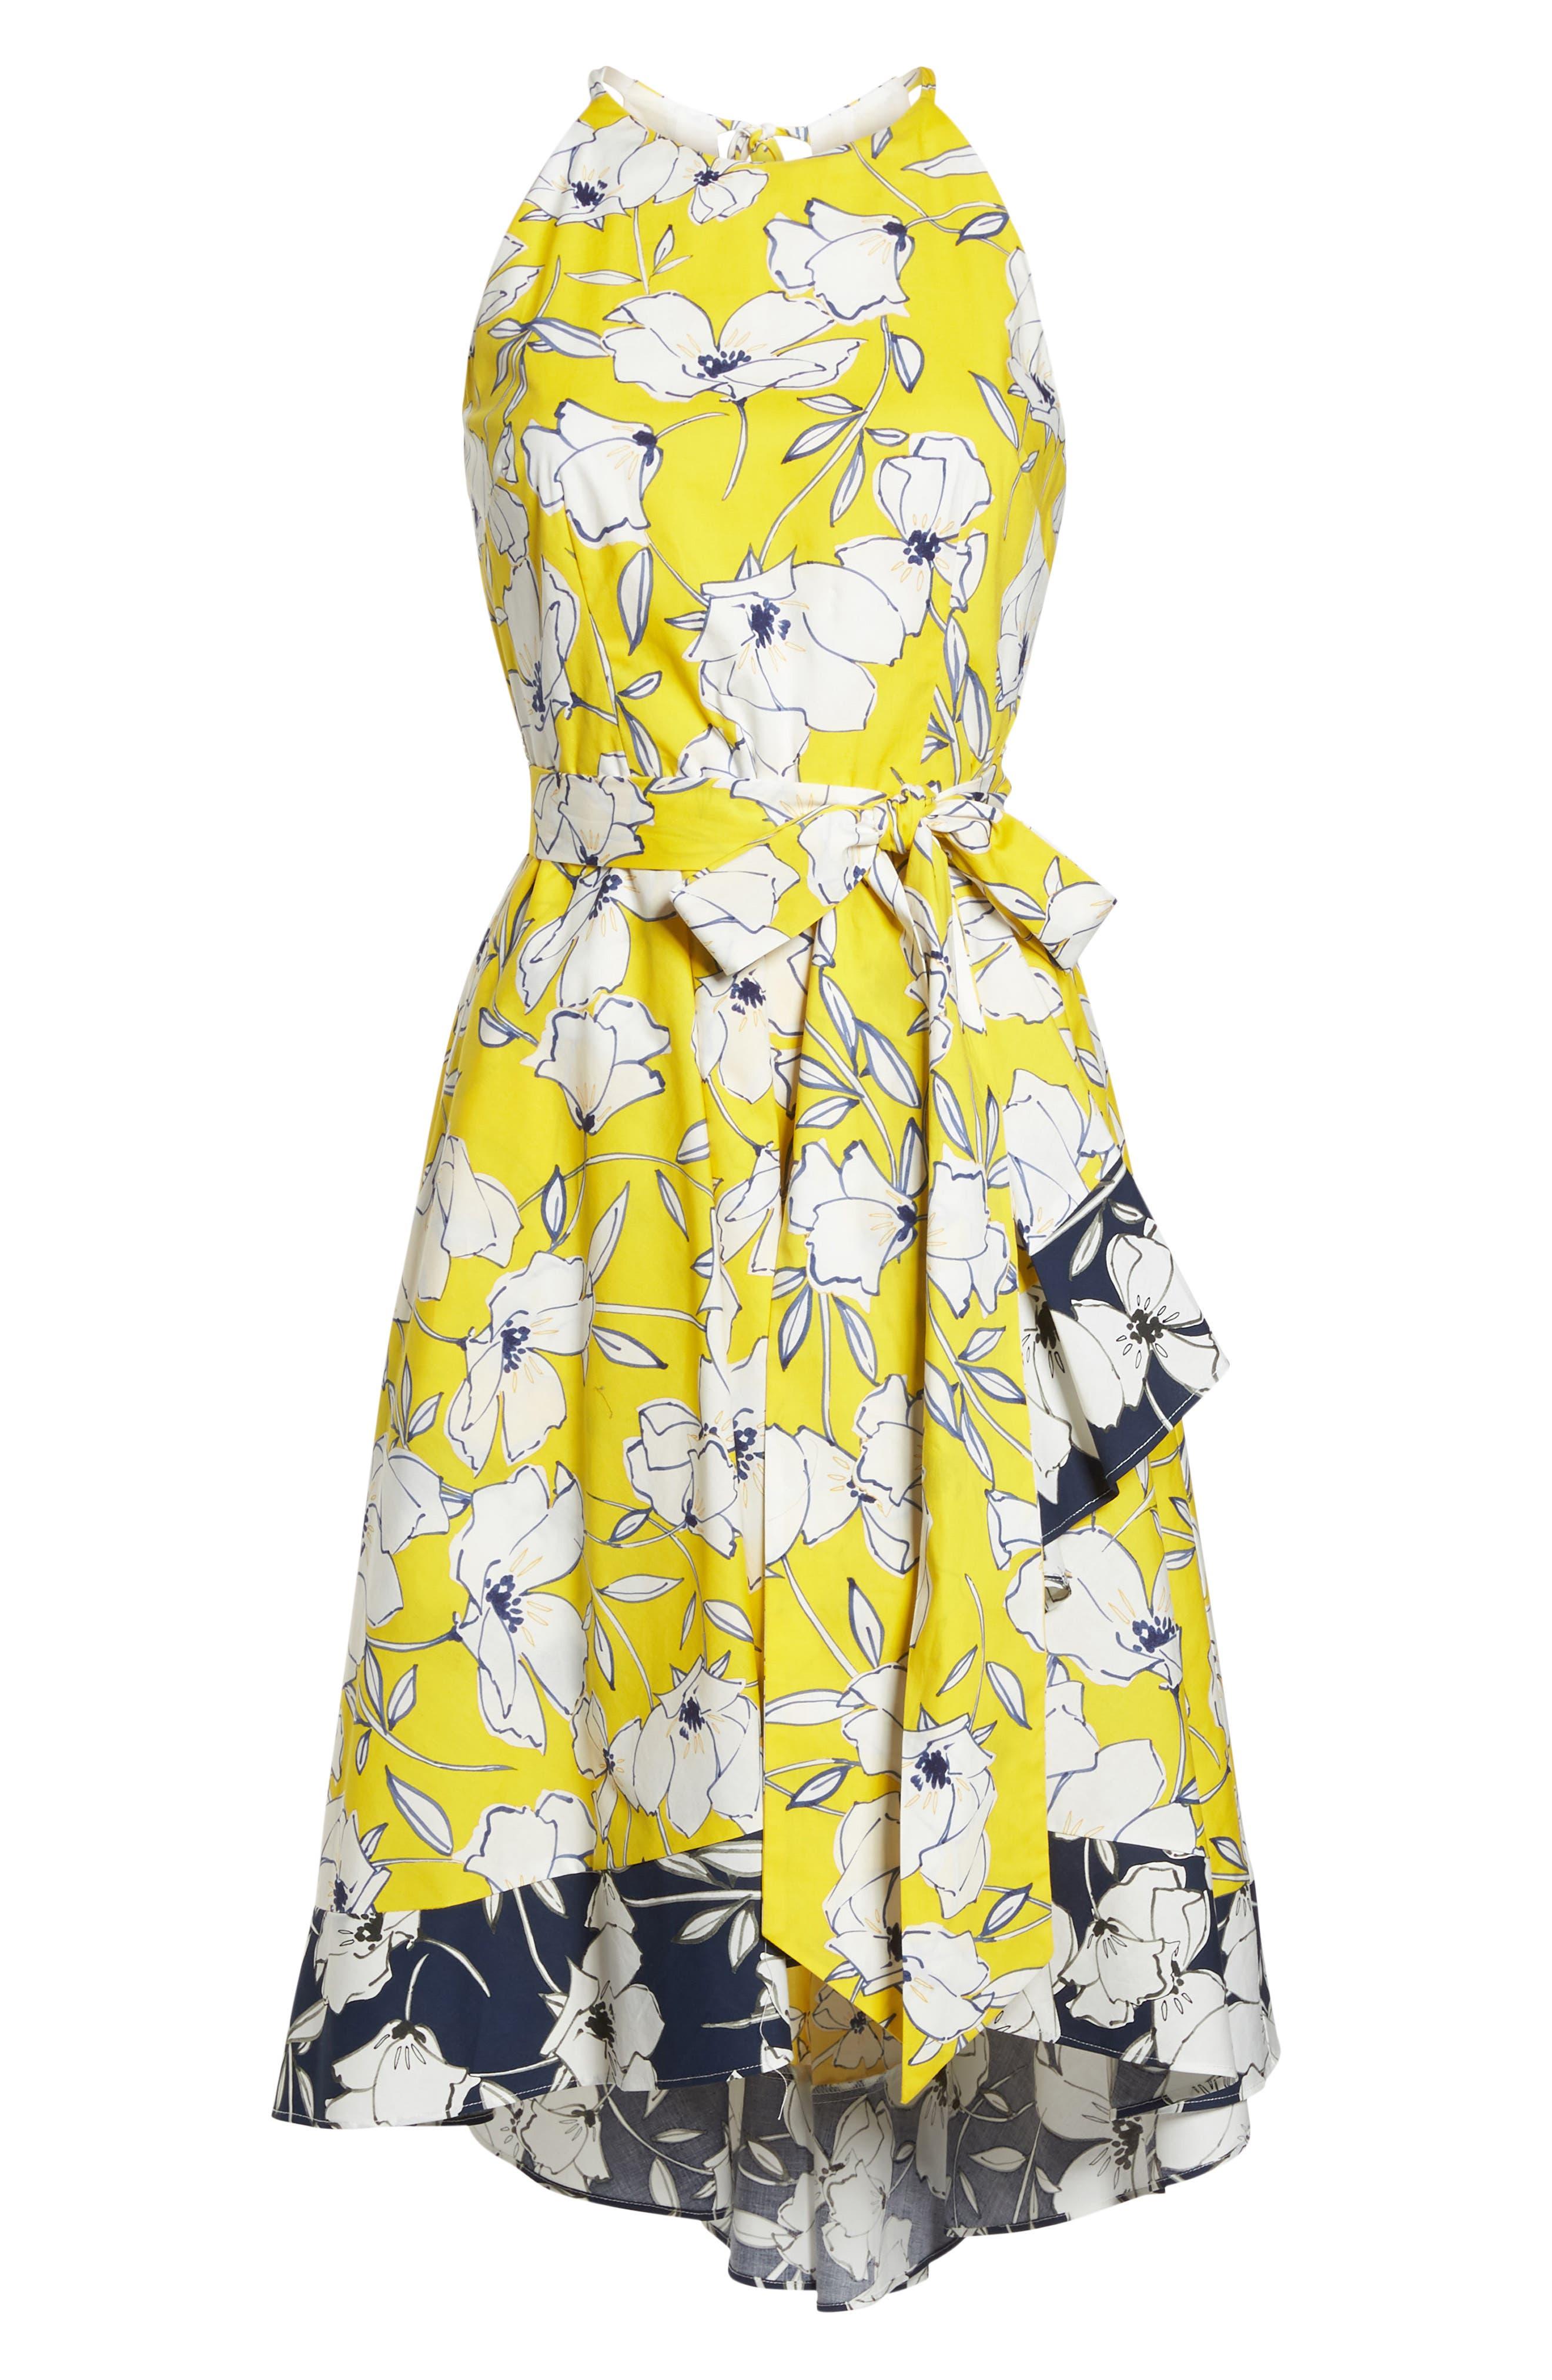 Floral Tie Waist Dress,                             Alternate thumbnail 7, color,                             Yellow/ Navy/ White